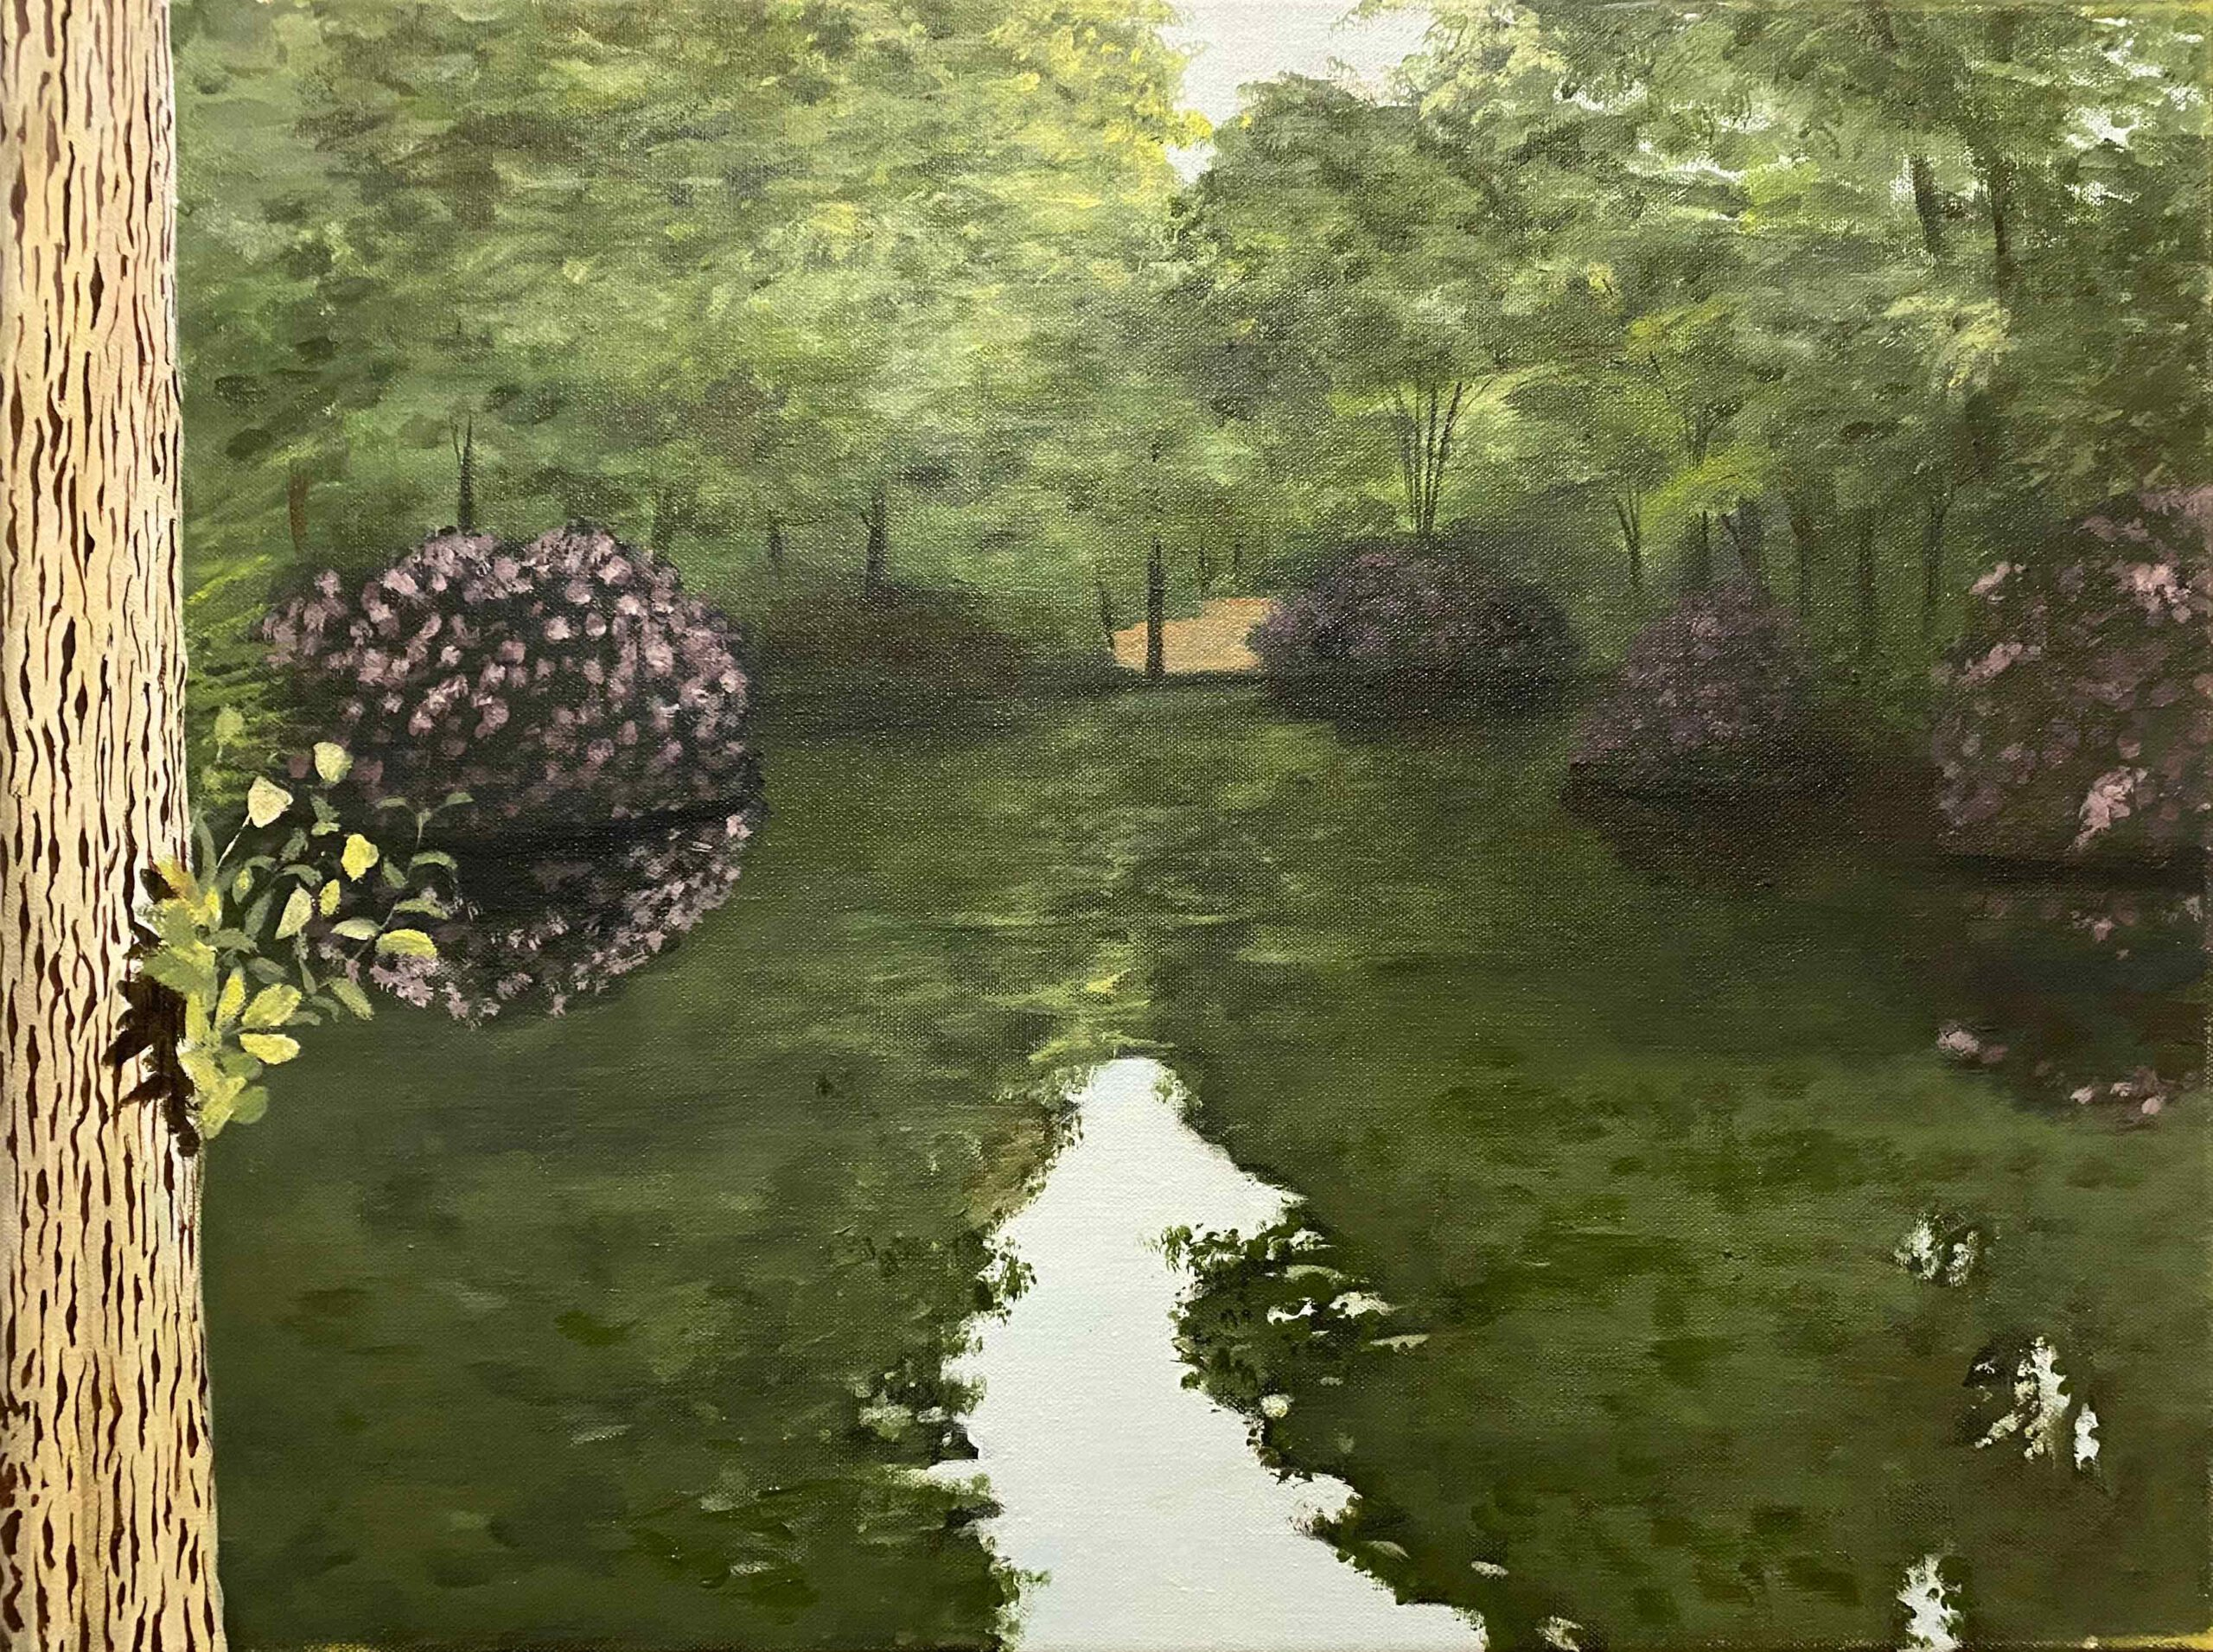 """Tiergarten in Blüte"" 50 x 70 cm, Acryl auf Leinwand, Felix Rieger 2017"